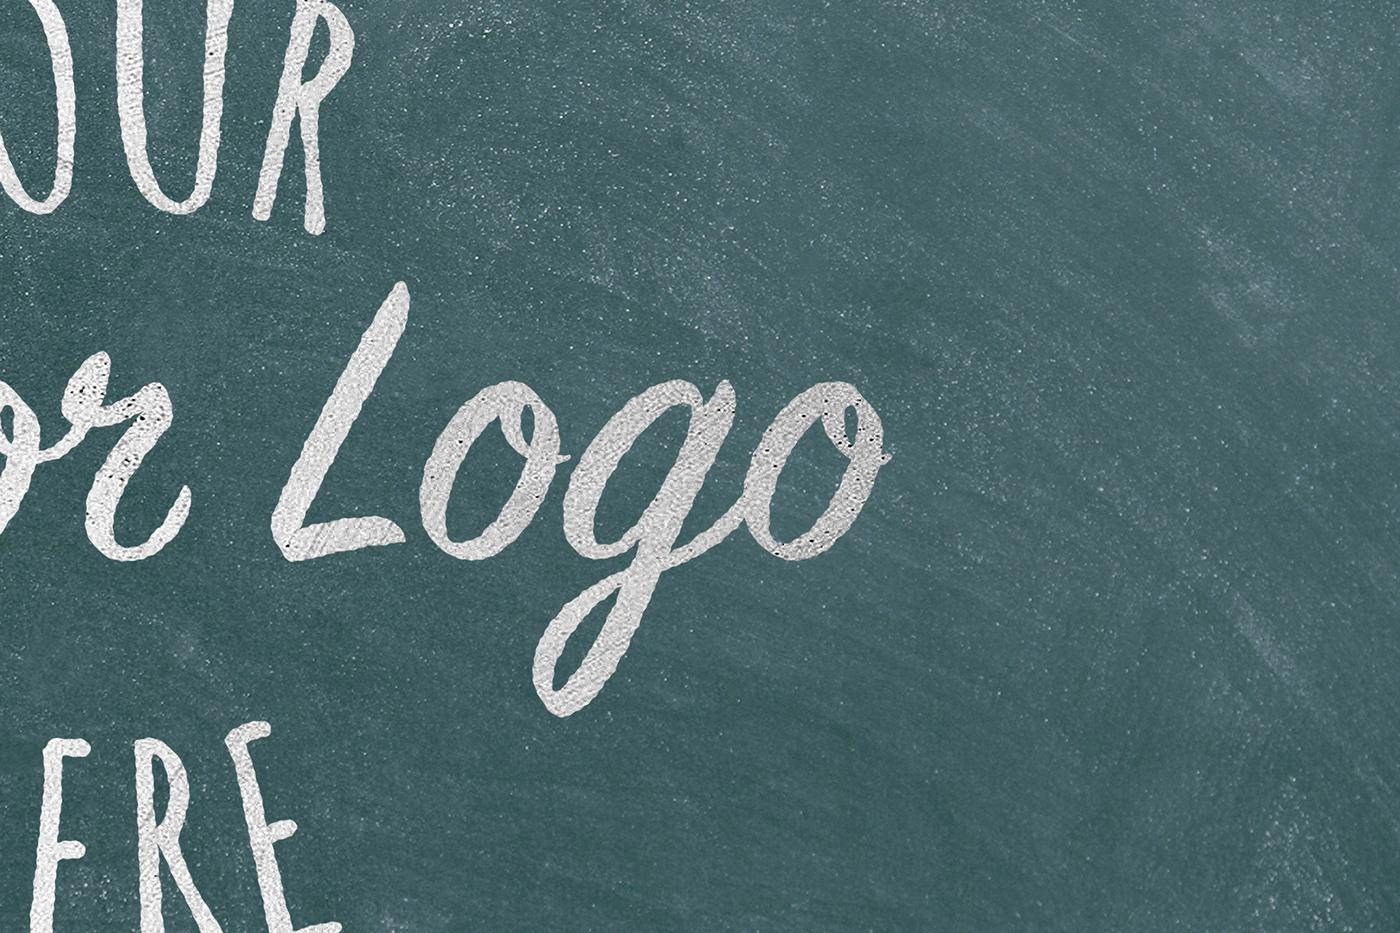 Mockup psd photoshop chalk blackboard logos textures Hipster graphic design